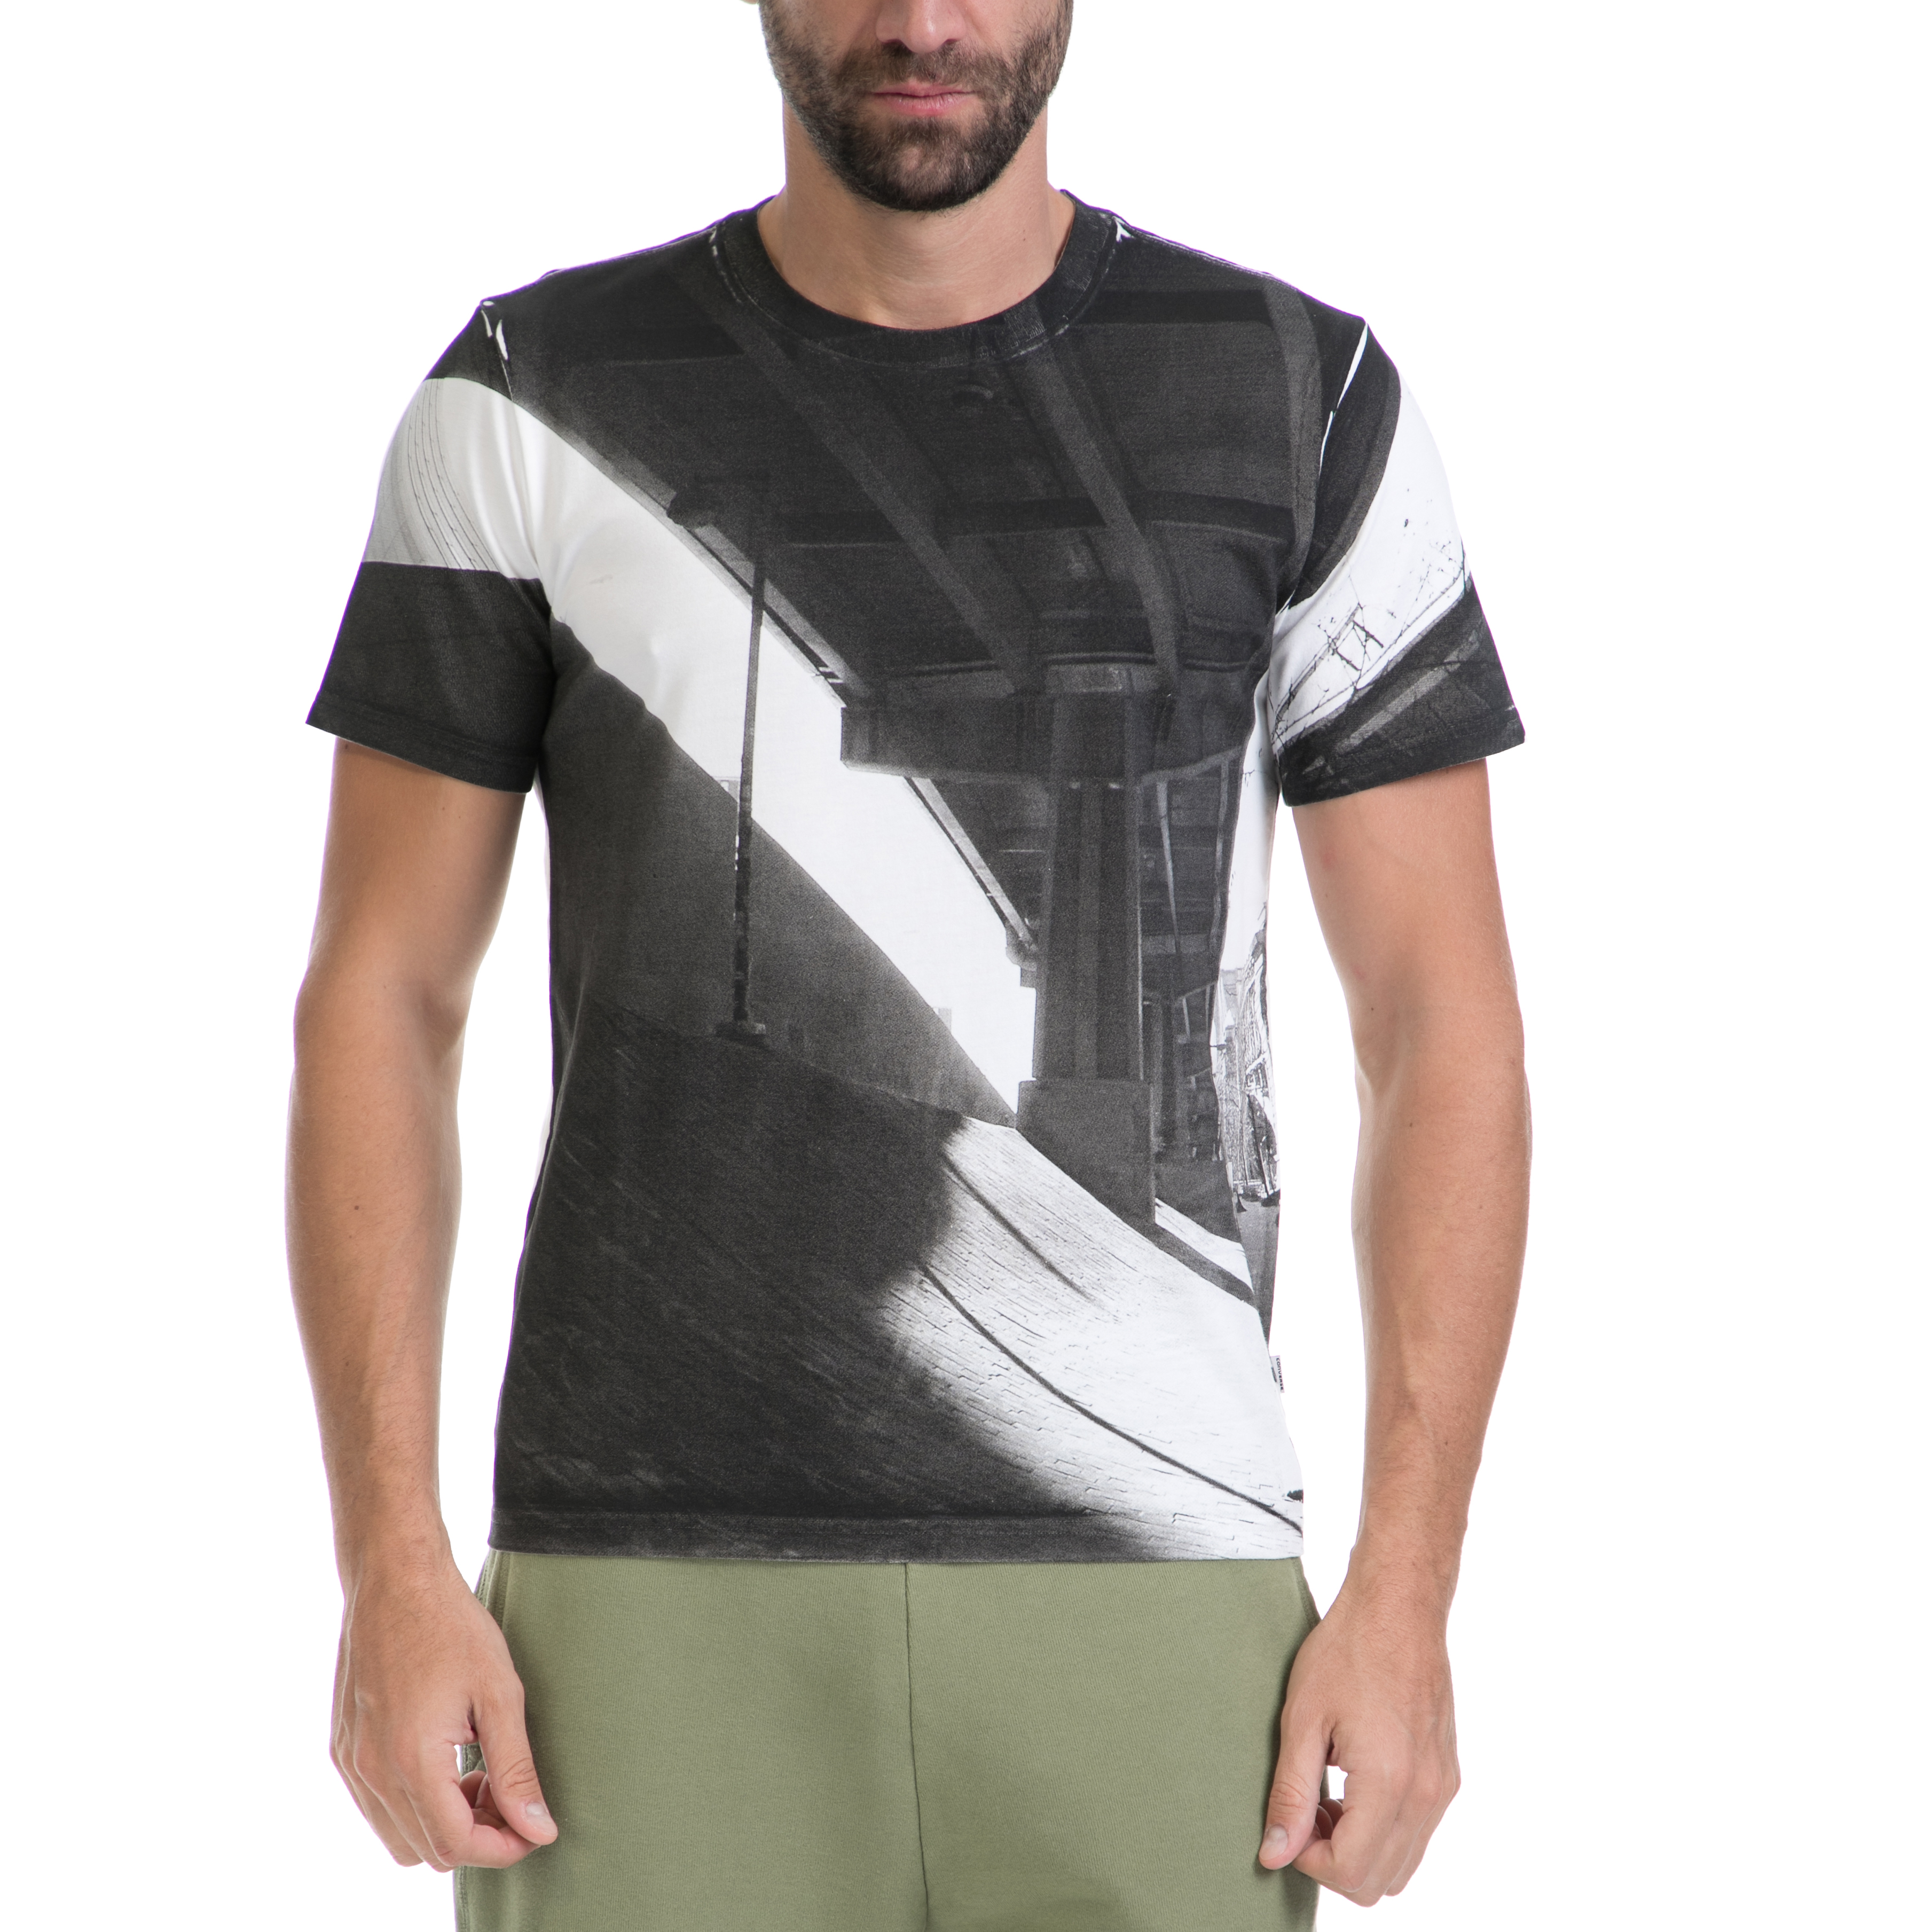 CONVERSE - Αντρική μπλούζα CONVERSE ασπρόμαυρη ανδρικά ρούχα αθλητικά t shirt